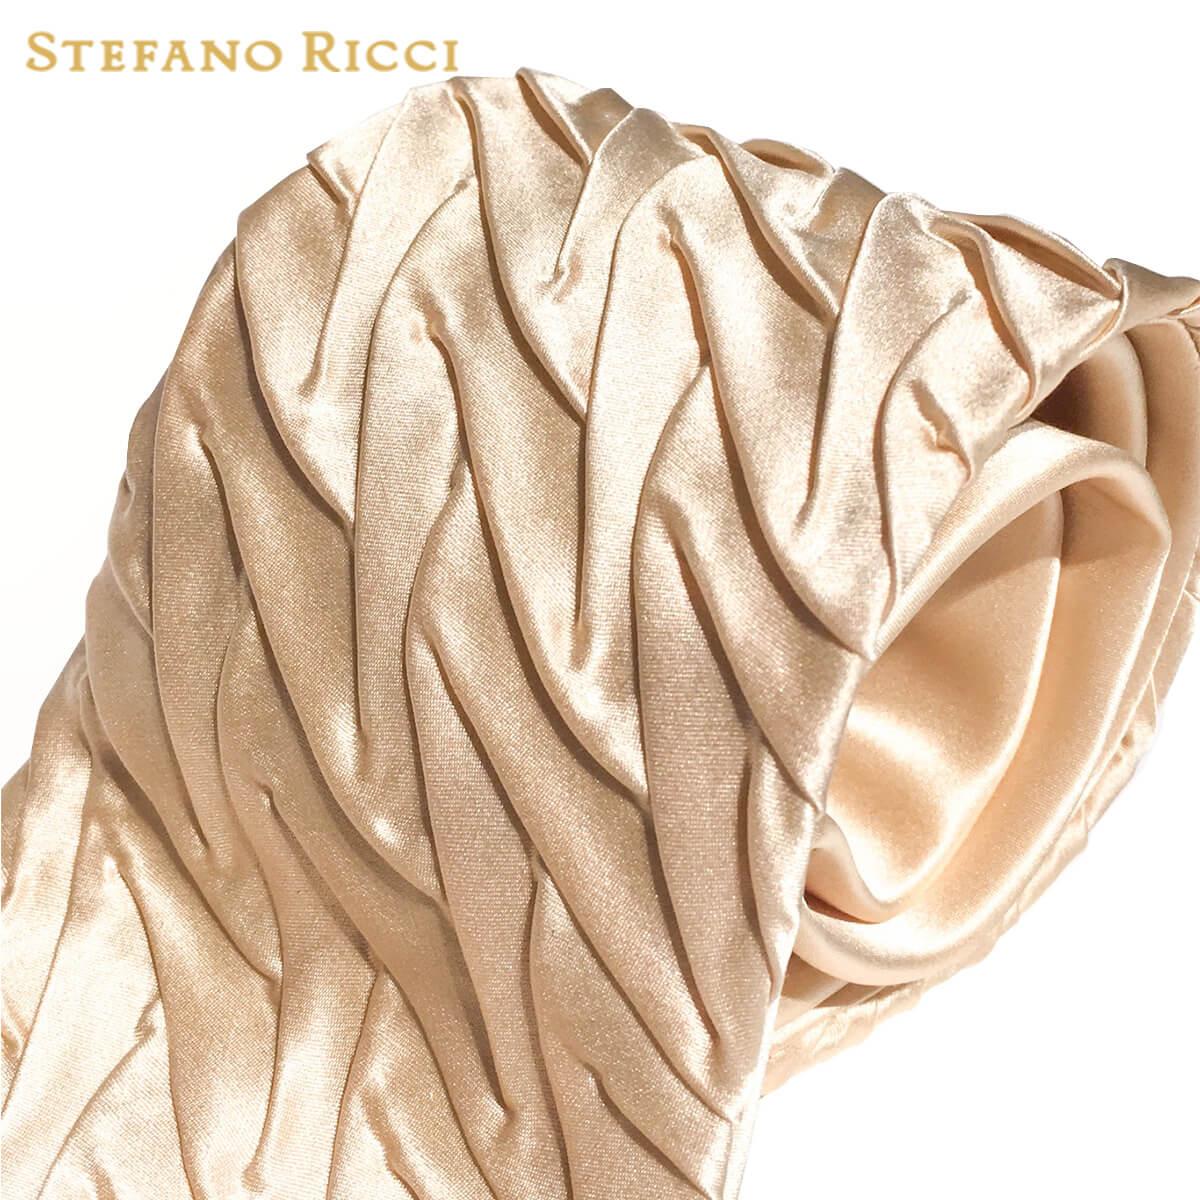 STEFANO RICCI(ステファノリッチ) ネクタイ プリーツ ベージュ プリーツタイ